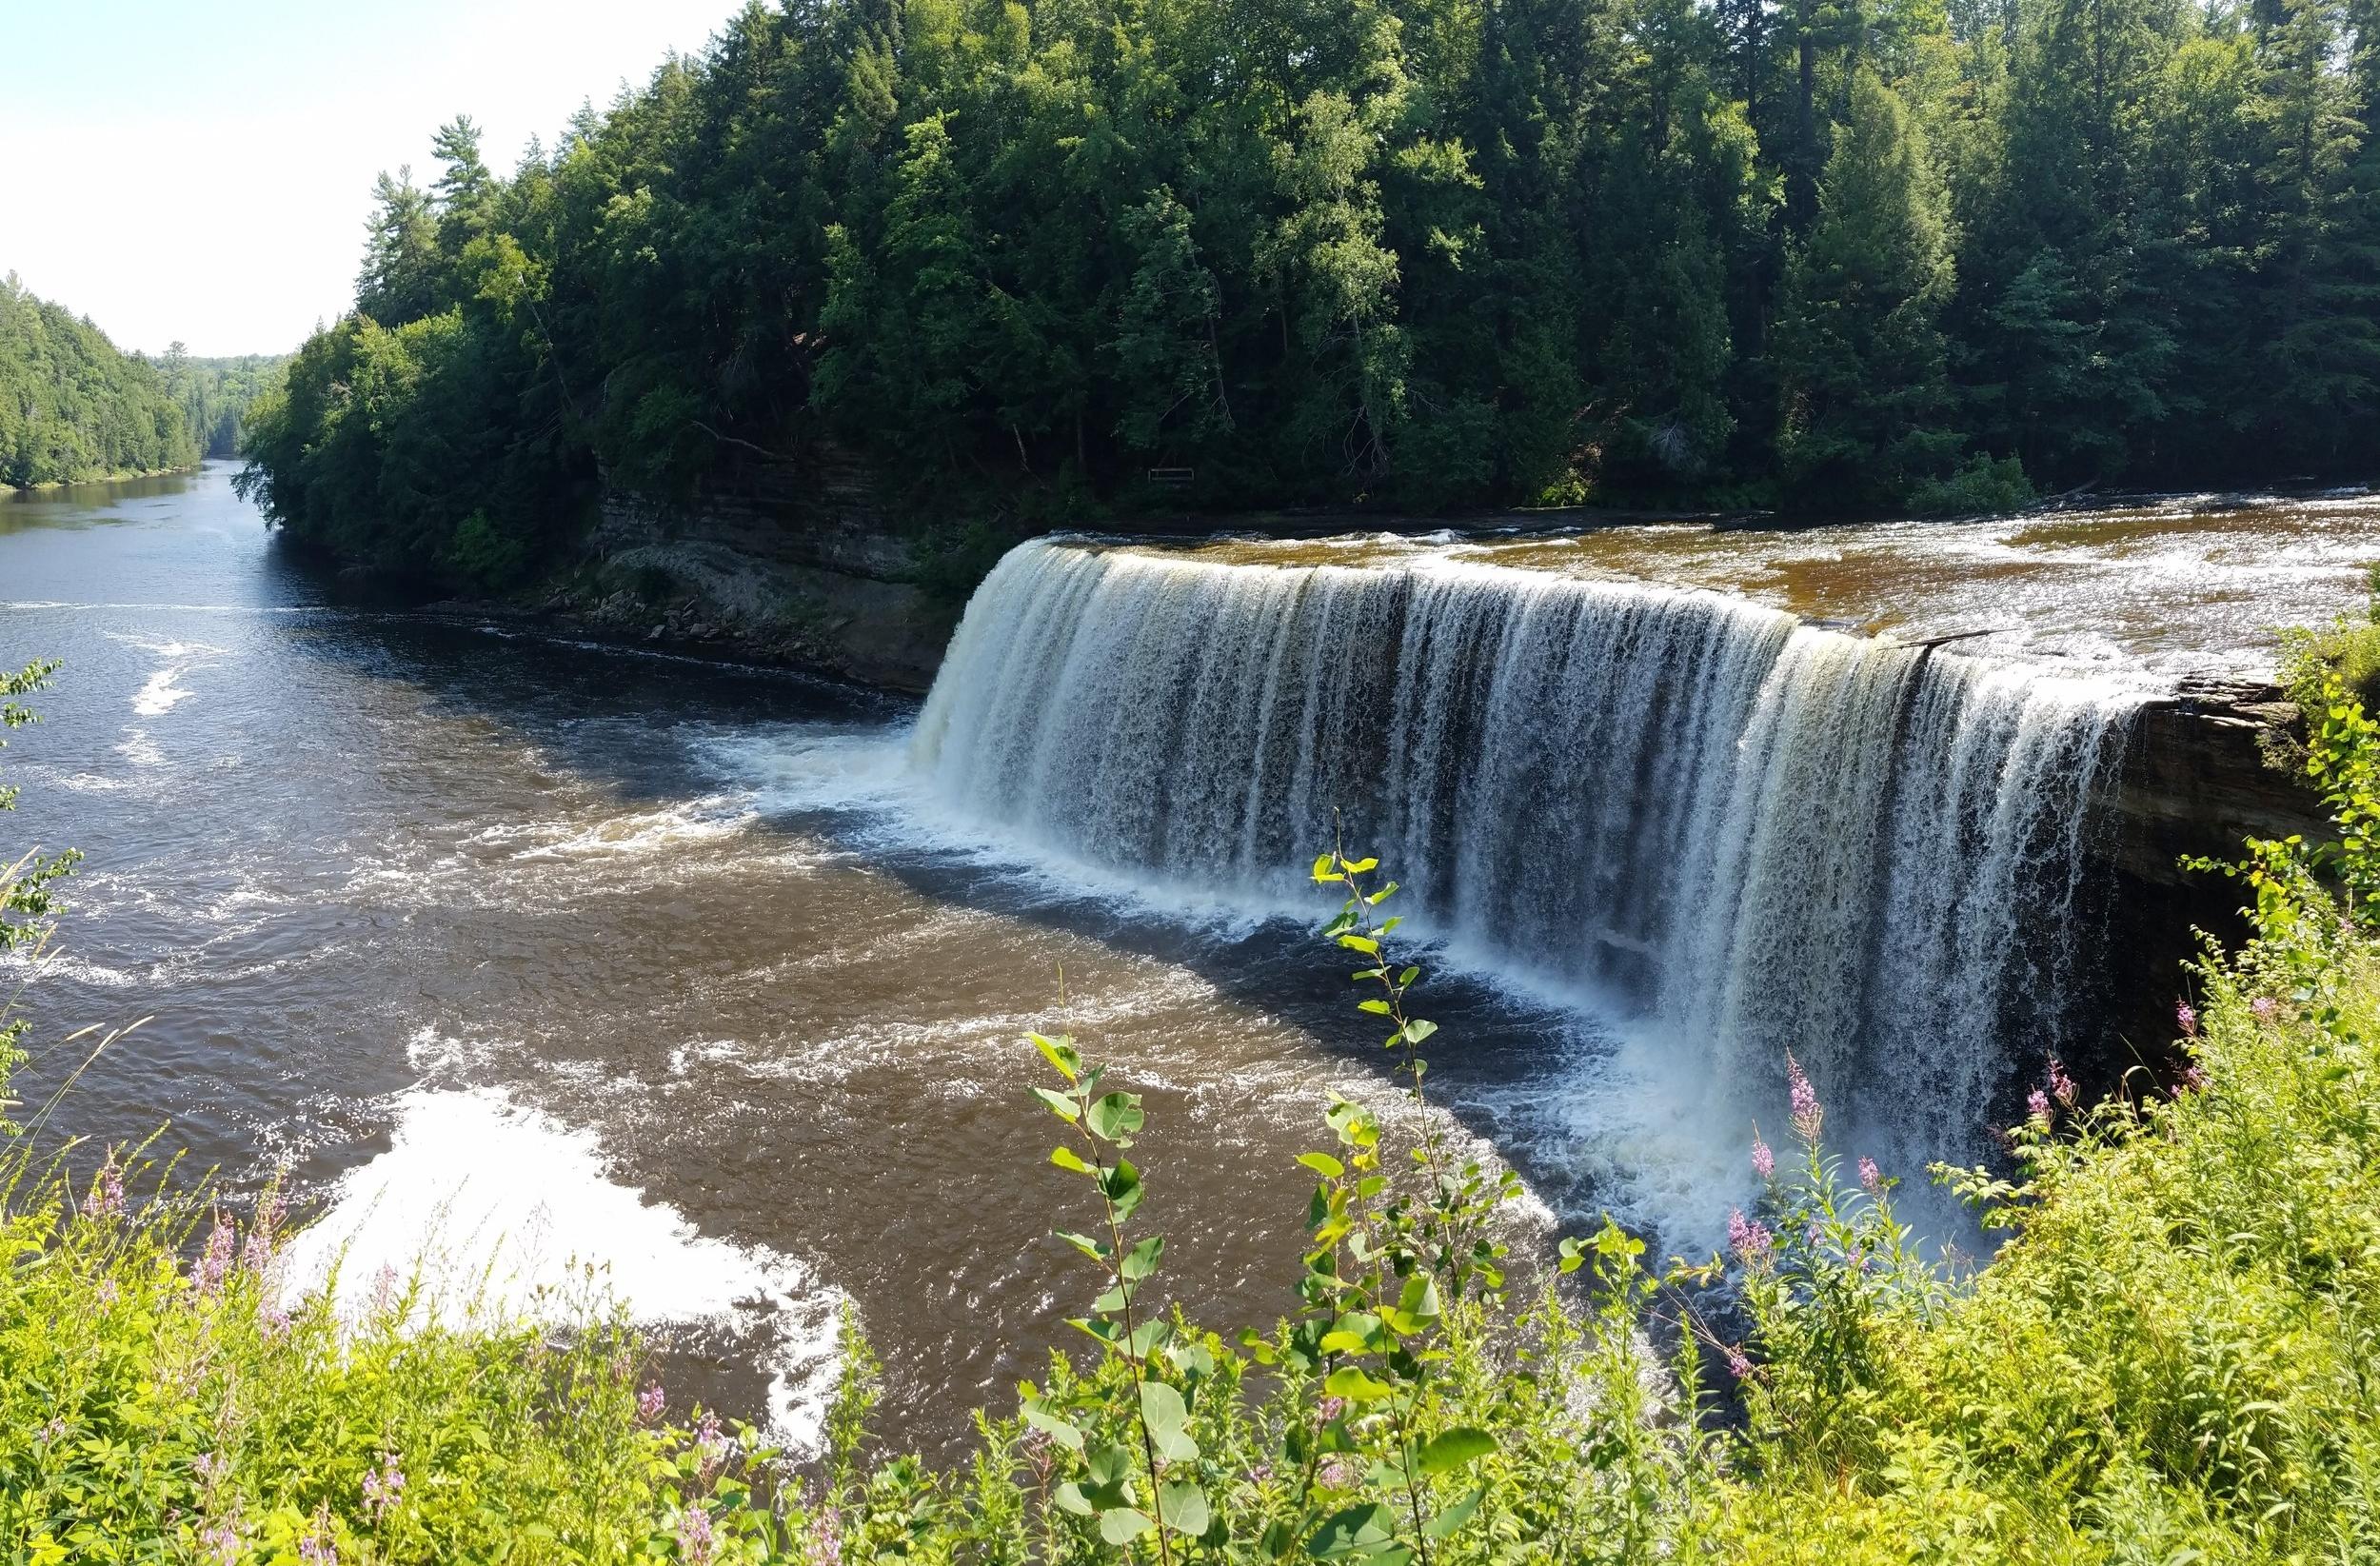 The Upper Falls at Tahquamenon Falls State Park